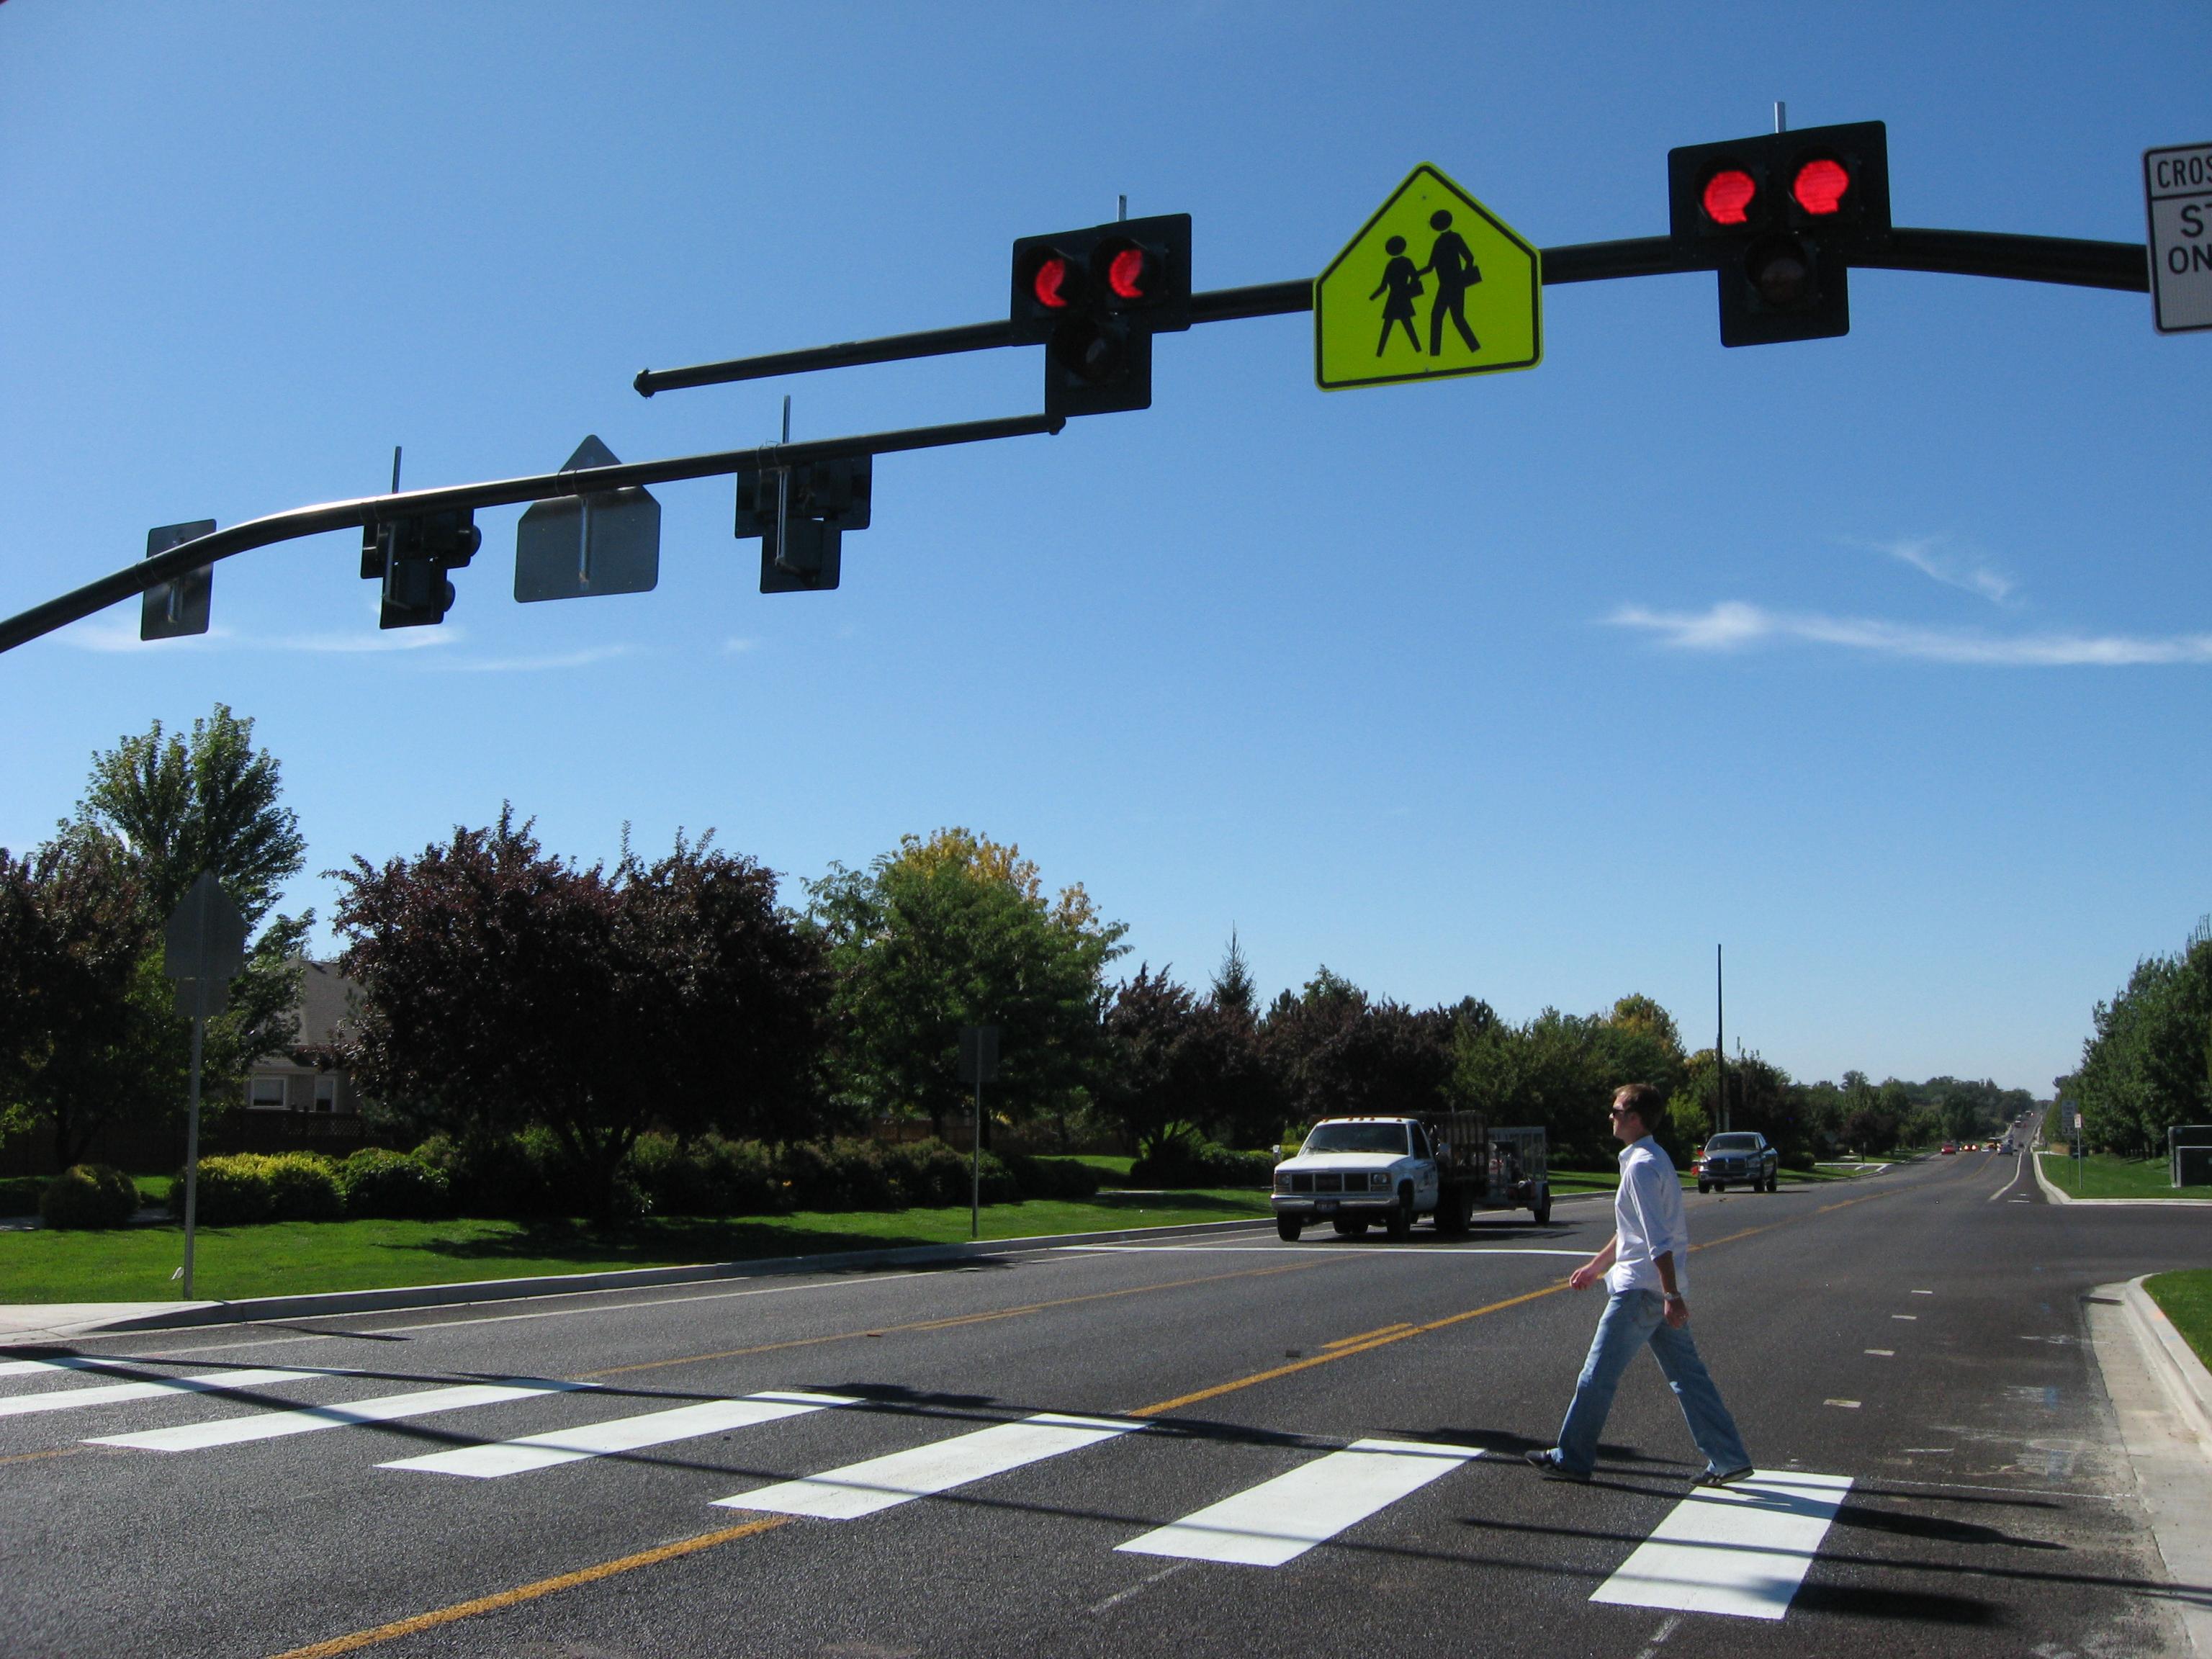 pedestrian hybrid beacons hawk signals explained michigan complete streets coalition. Black Bedroom Furniture Sets. Home Design Ideas